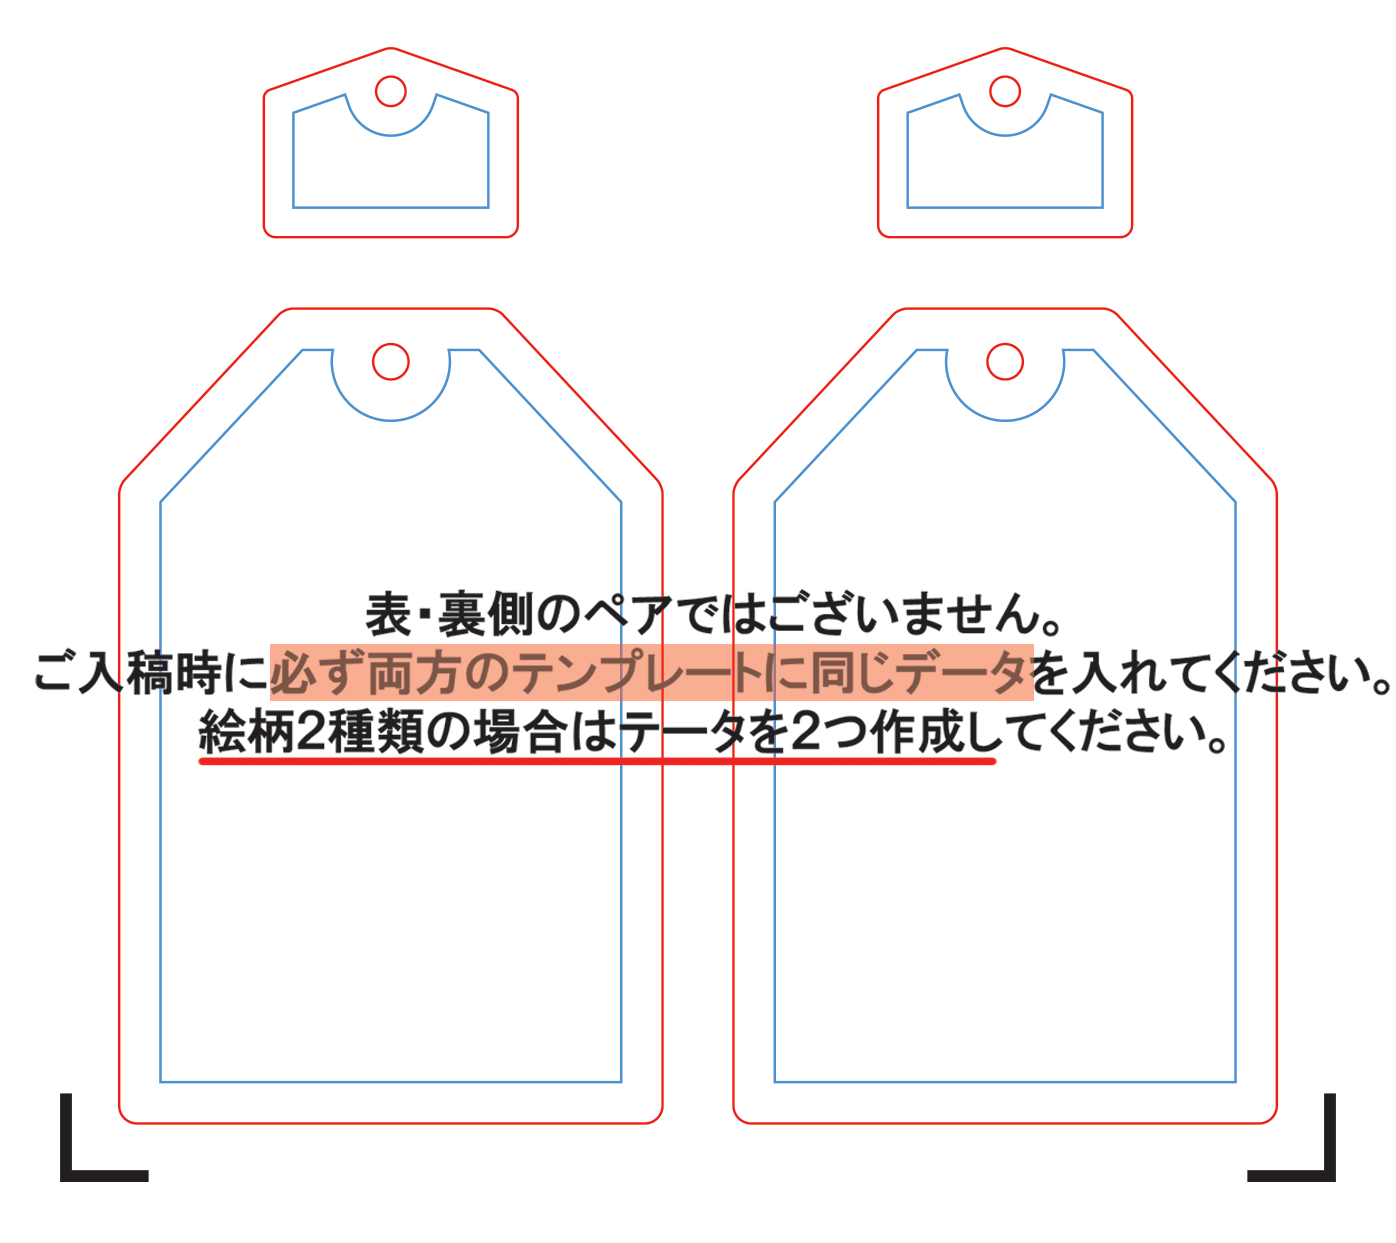 Jellyキーホルダーお守り形(キーホルダー付き/ラメ・オーロラ生地)